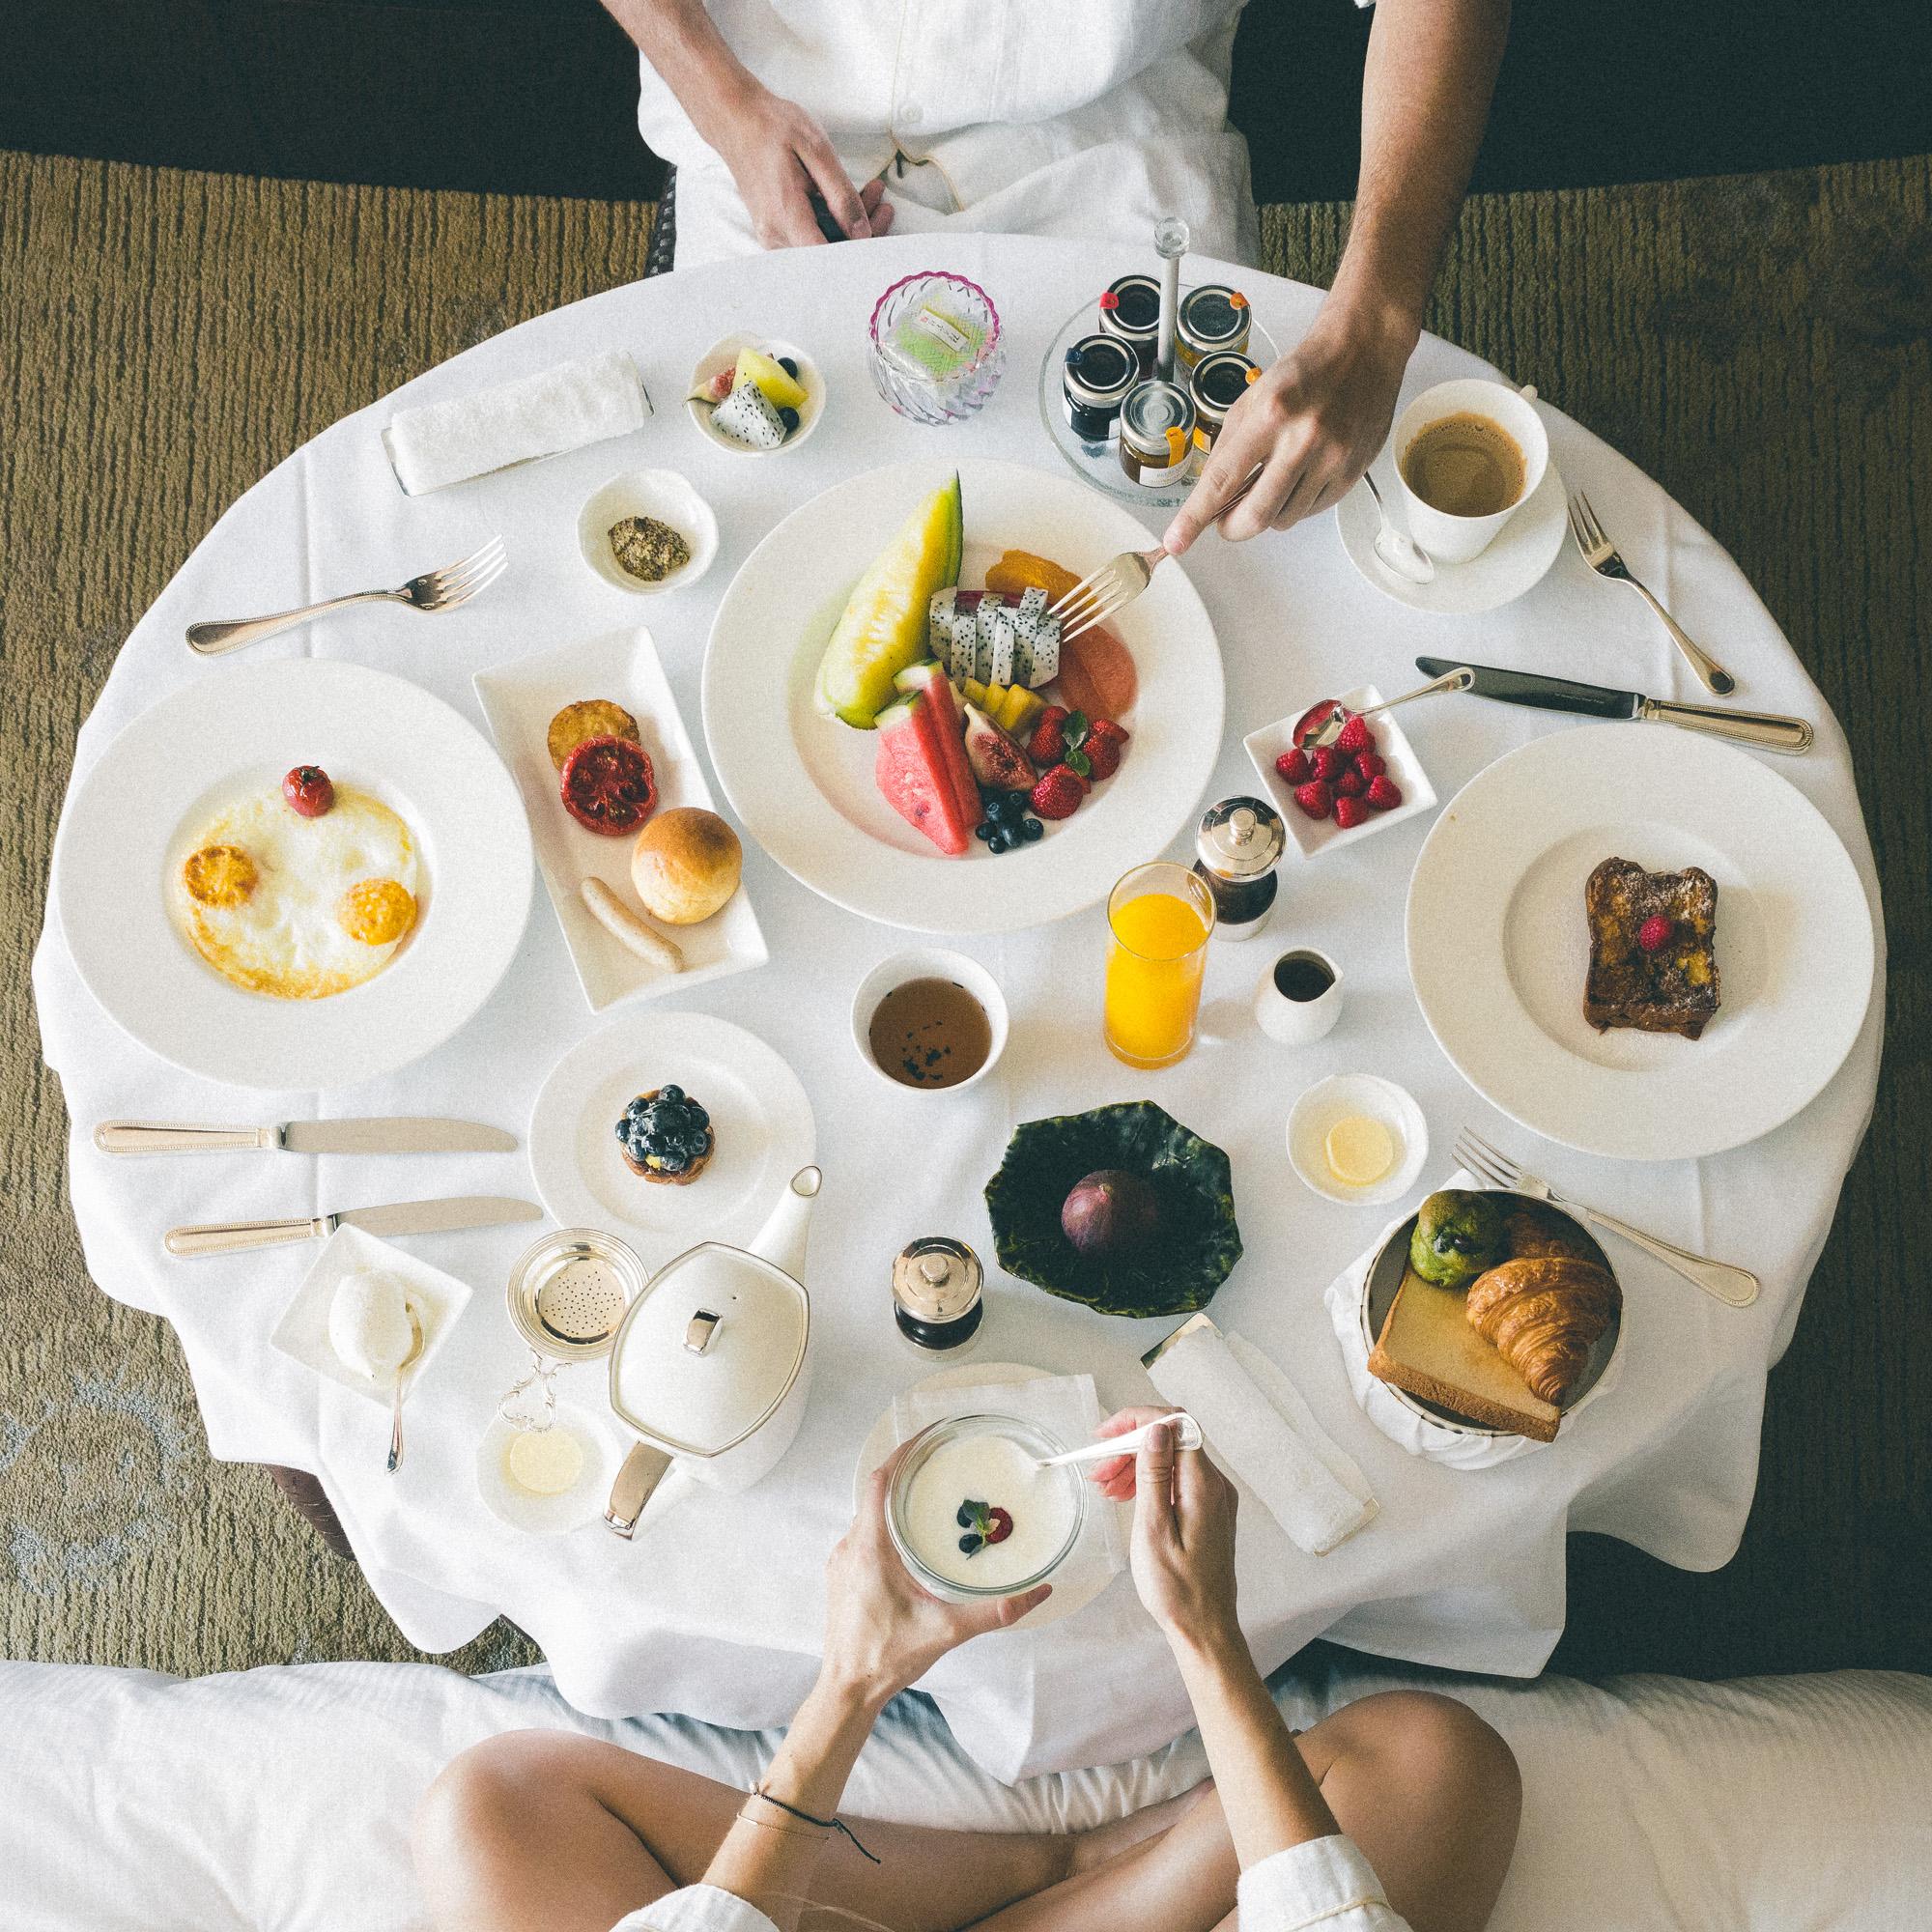 The Complete Tokyo Travel Guide | City Guides | Hotels in Tokyo | Shangri-La Hotel Tokyo | Japan Travel Itinerary | Shinjuku Shibuya Harujuku Neighborhood Travel Tips